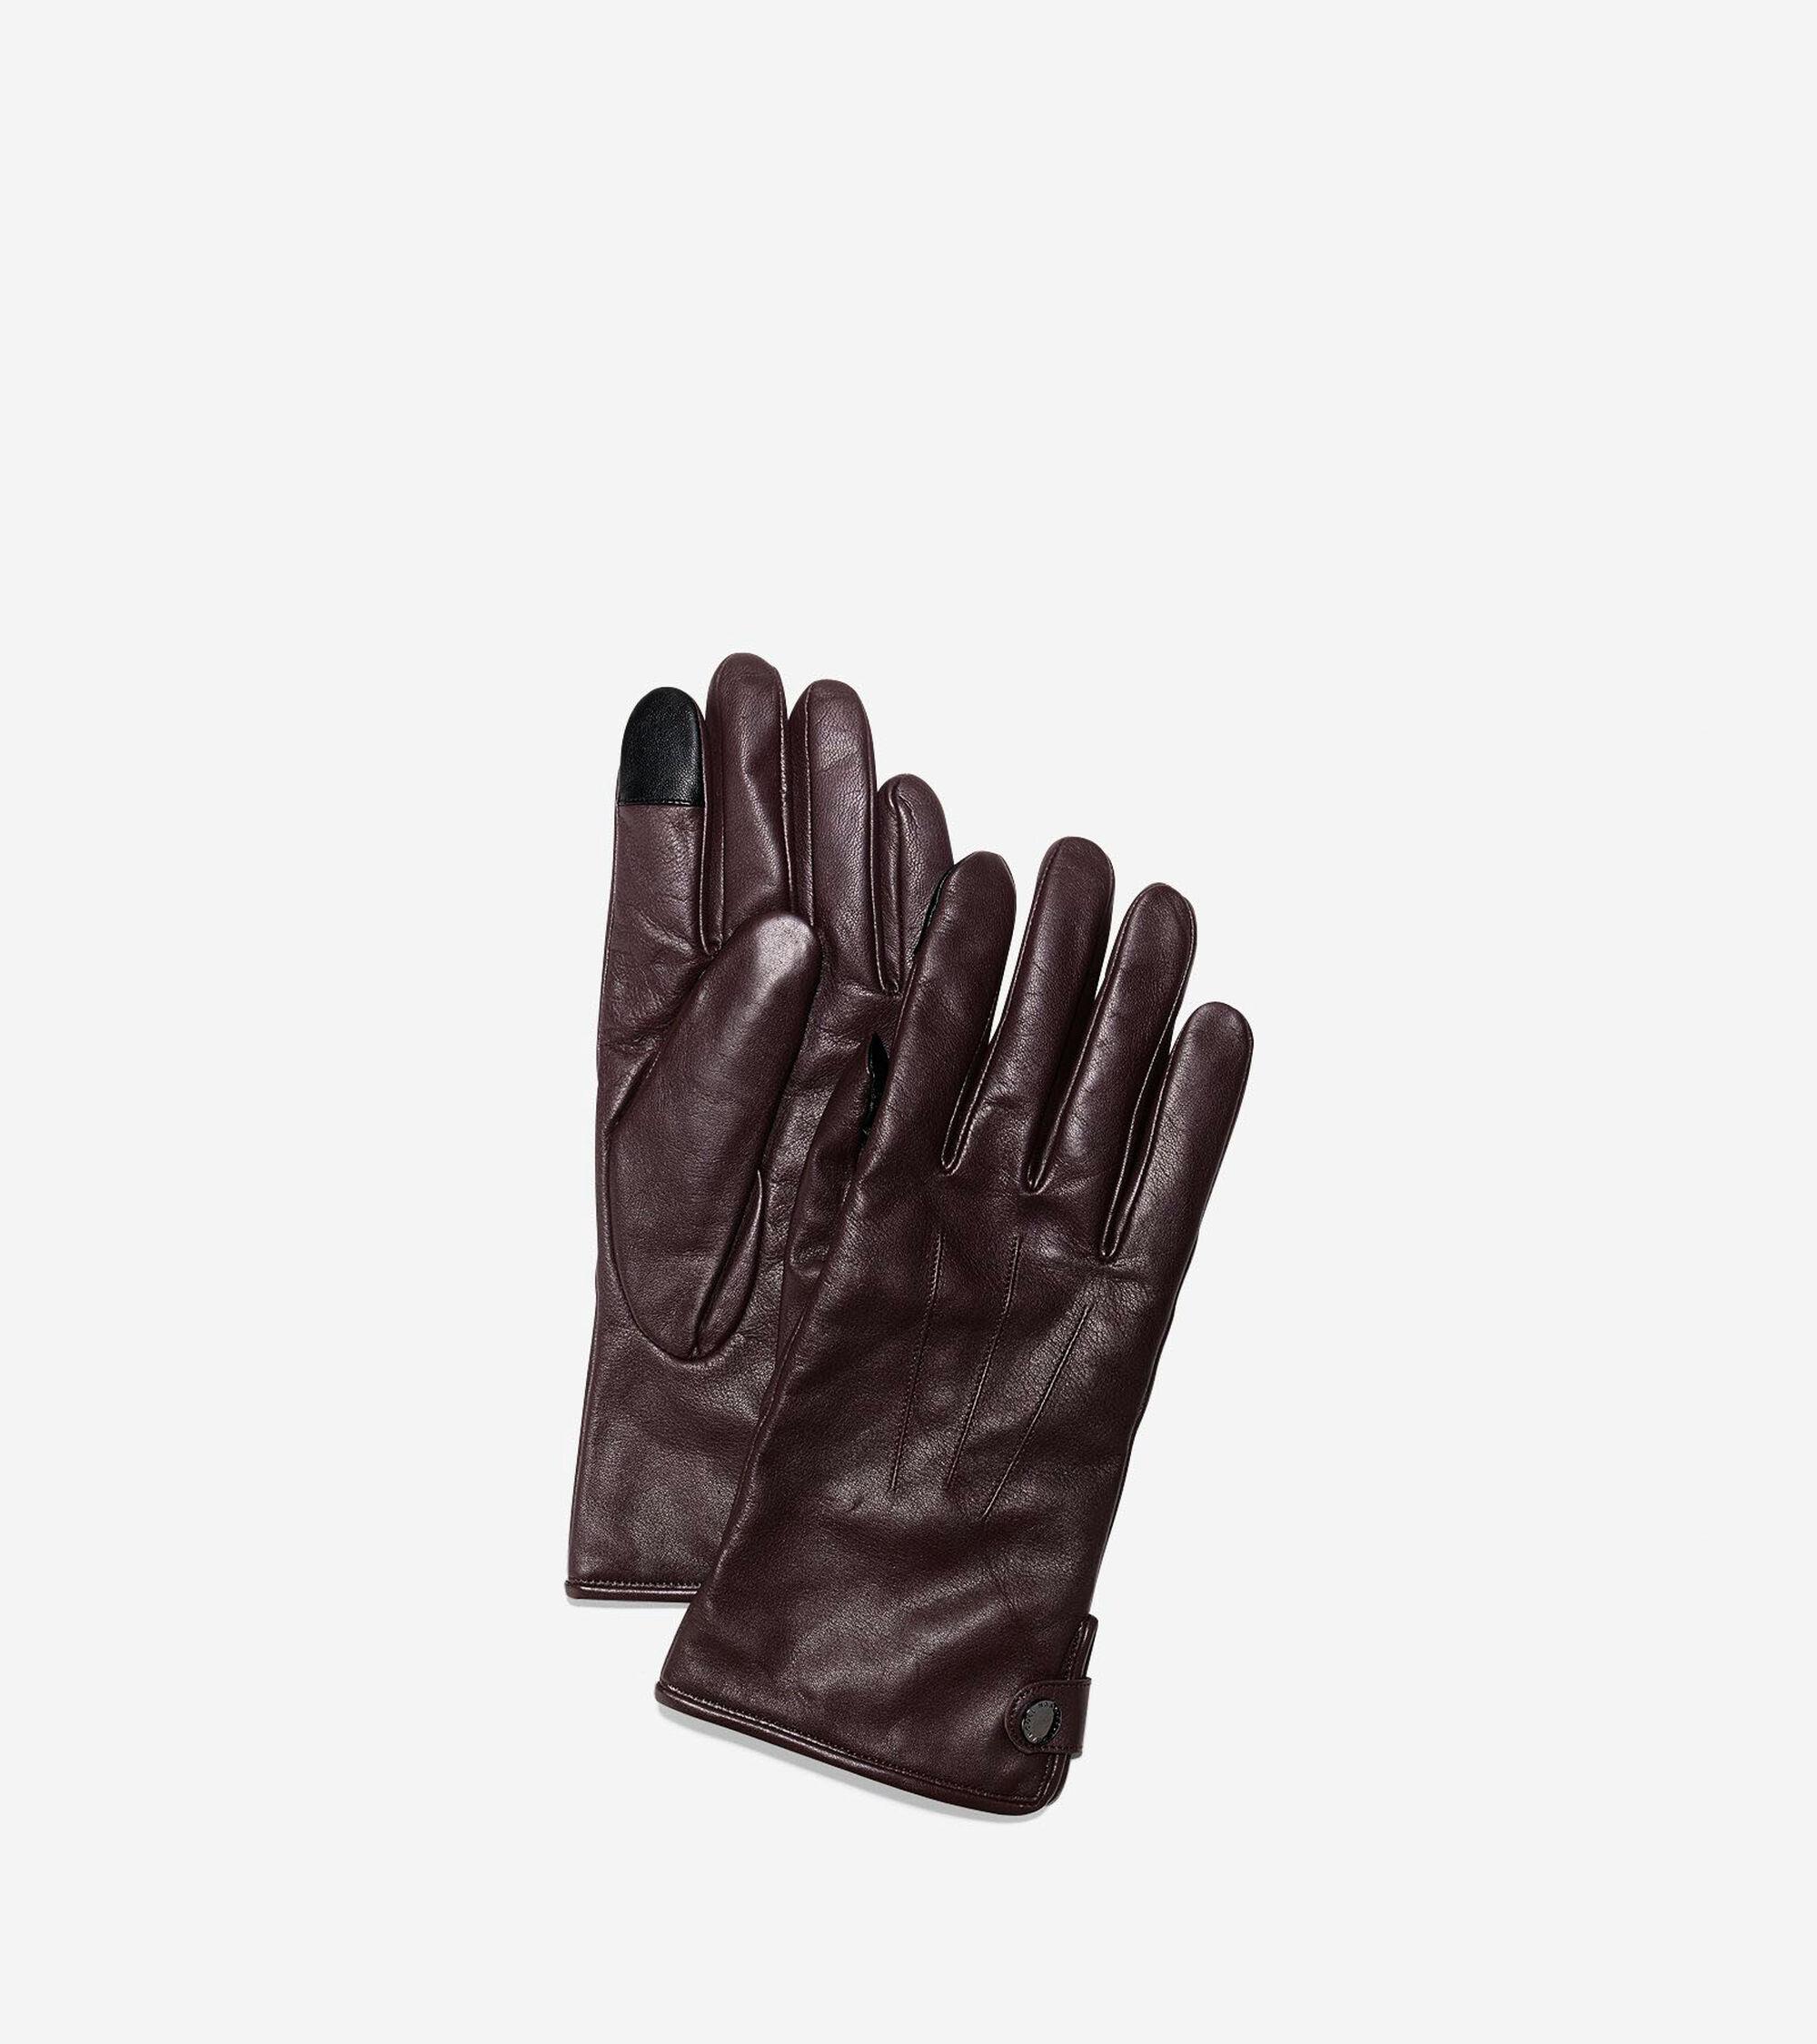 Gloves > Men's Side Snap Gloves With Center Points